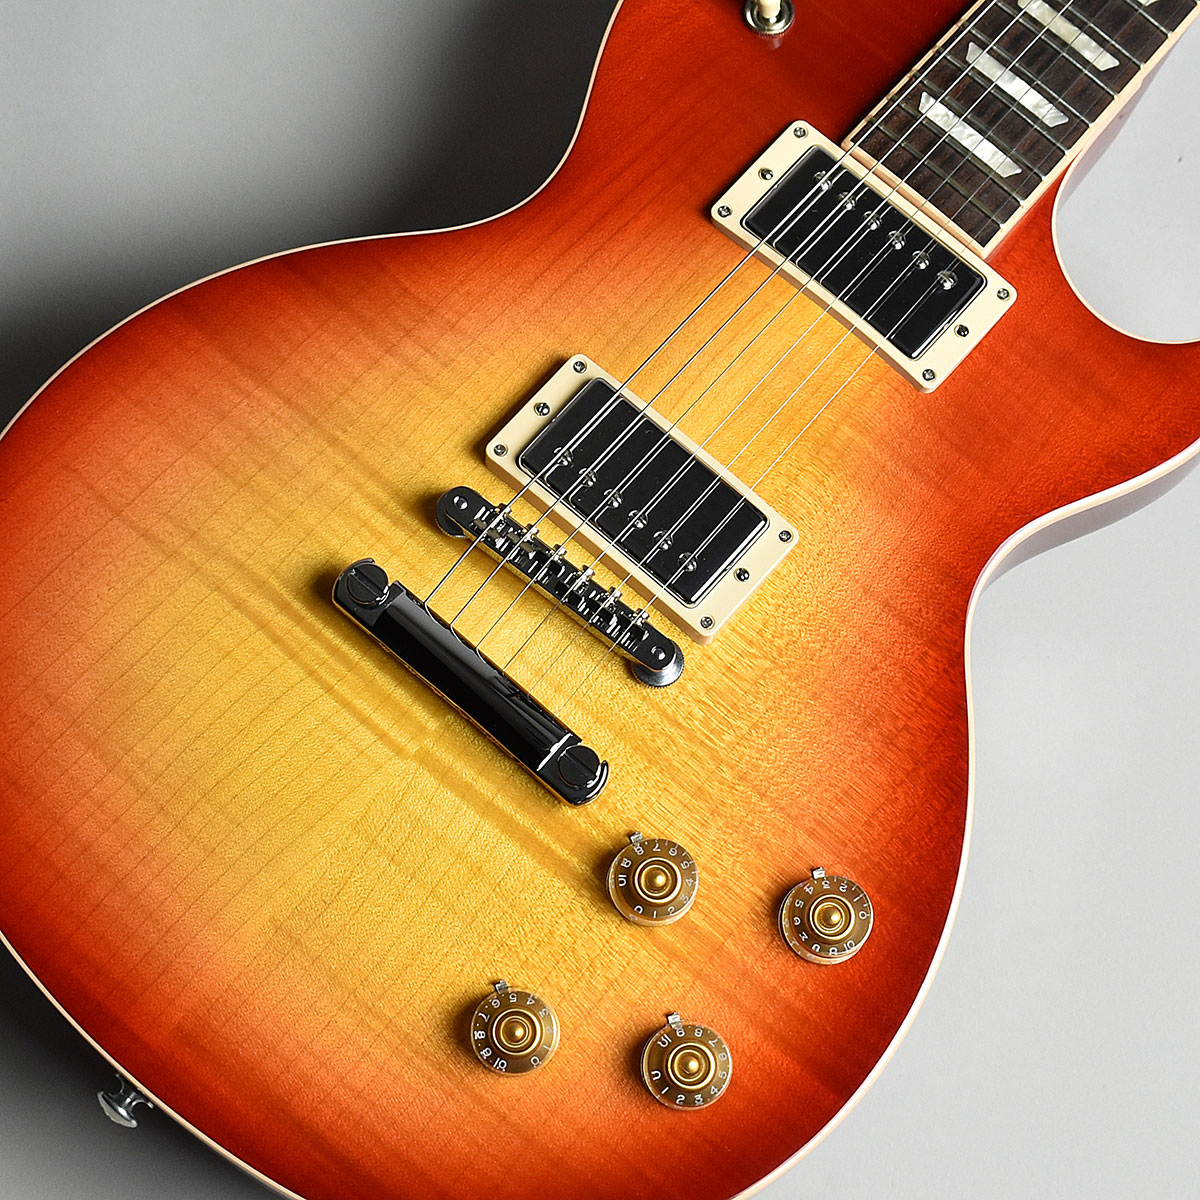 Gibson Les Paul Traditional Pro Plus 2017 Limited Heritage Cherry Sunburst S/N:170074946 レスポールトラディショナル 【ギブソン】【未展示品】